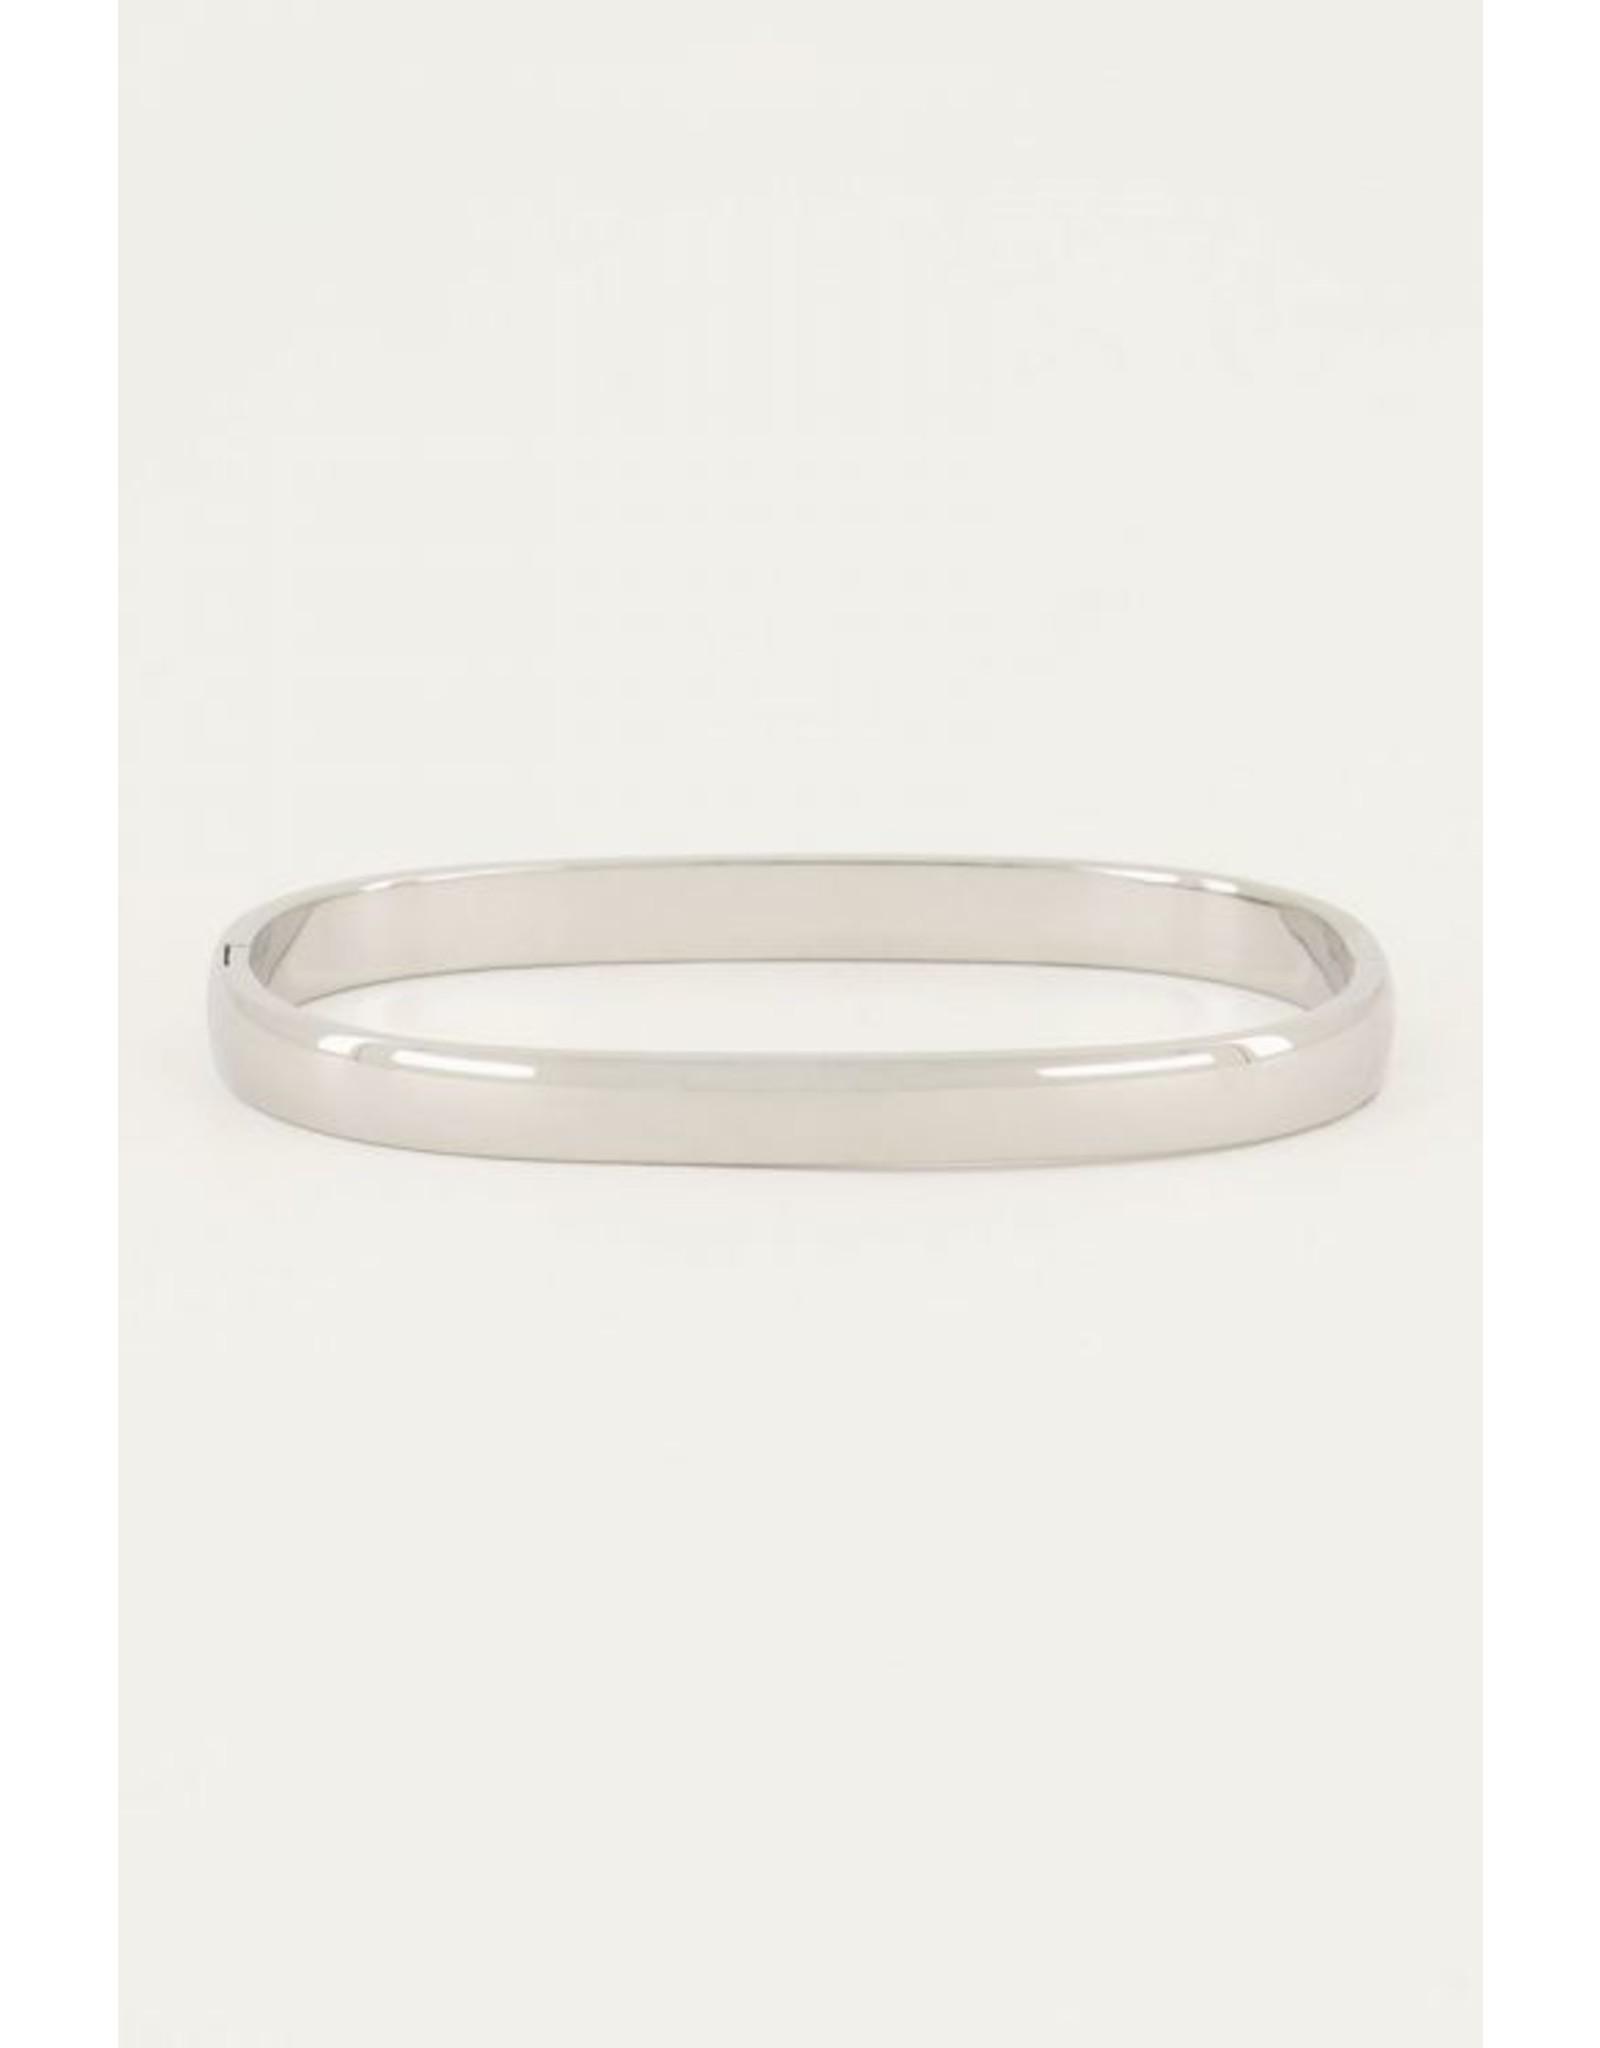 Bangle rectangle silver